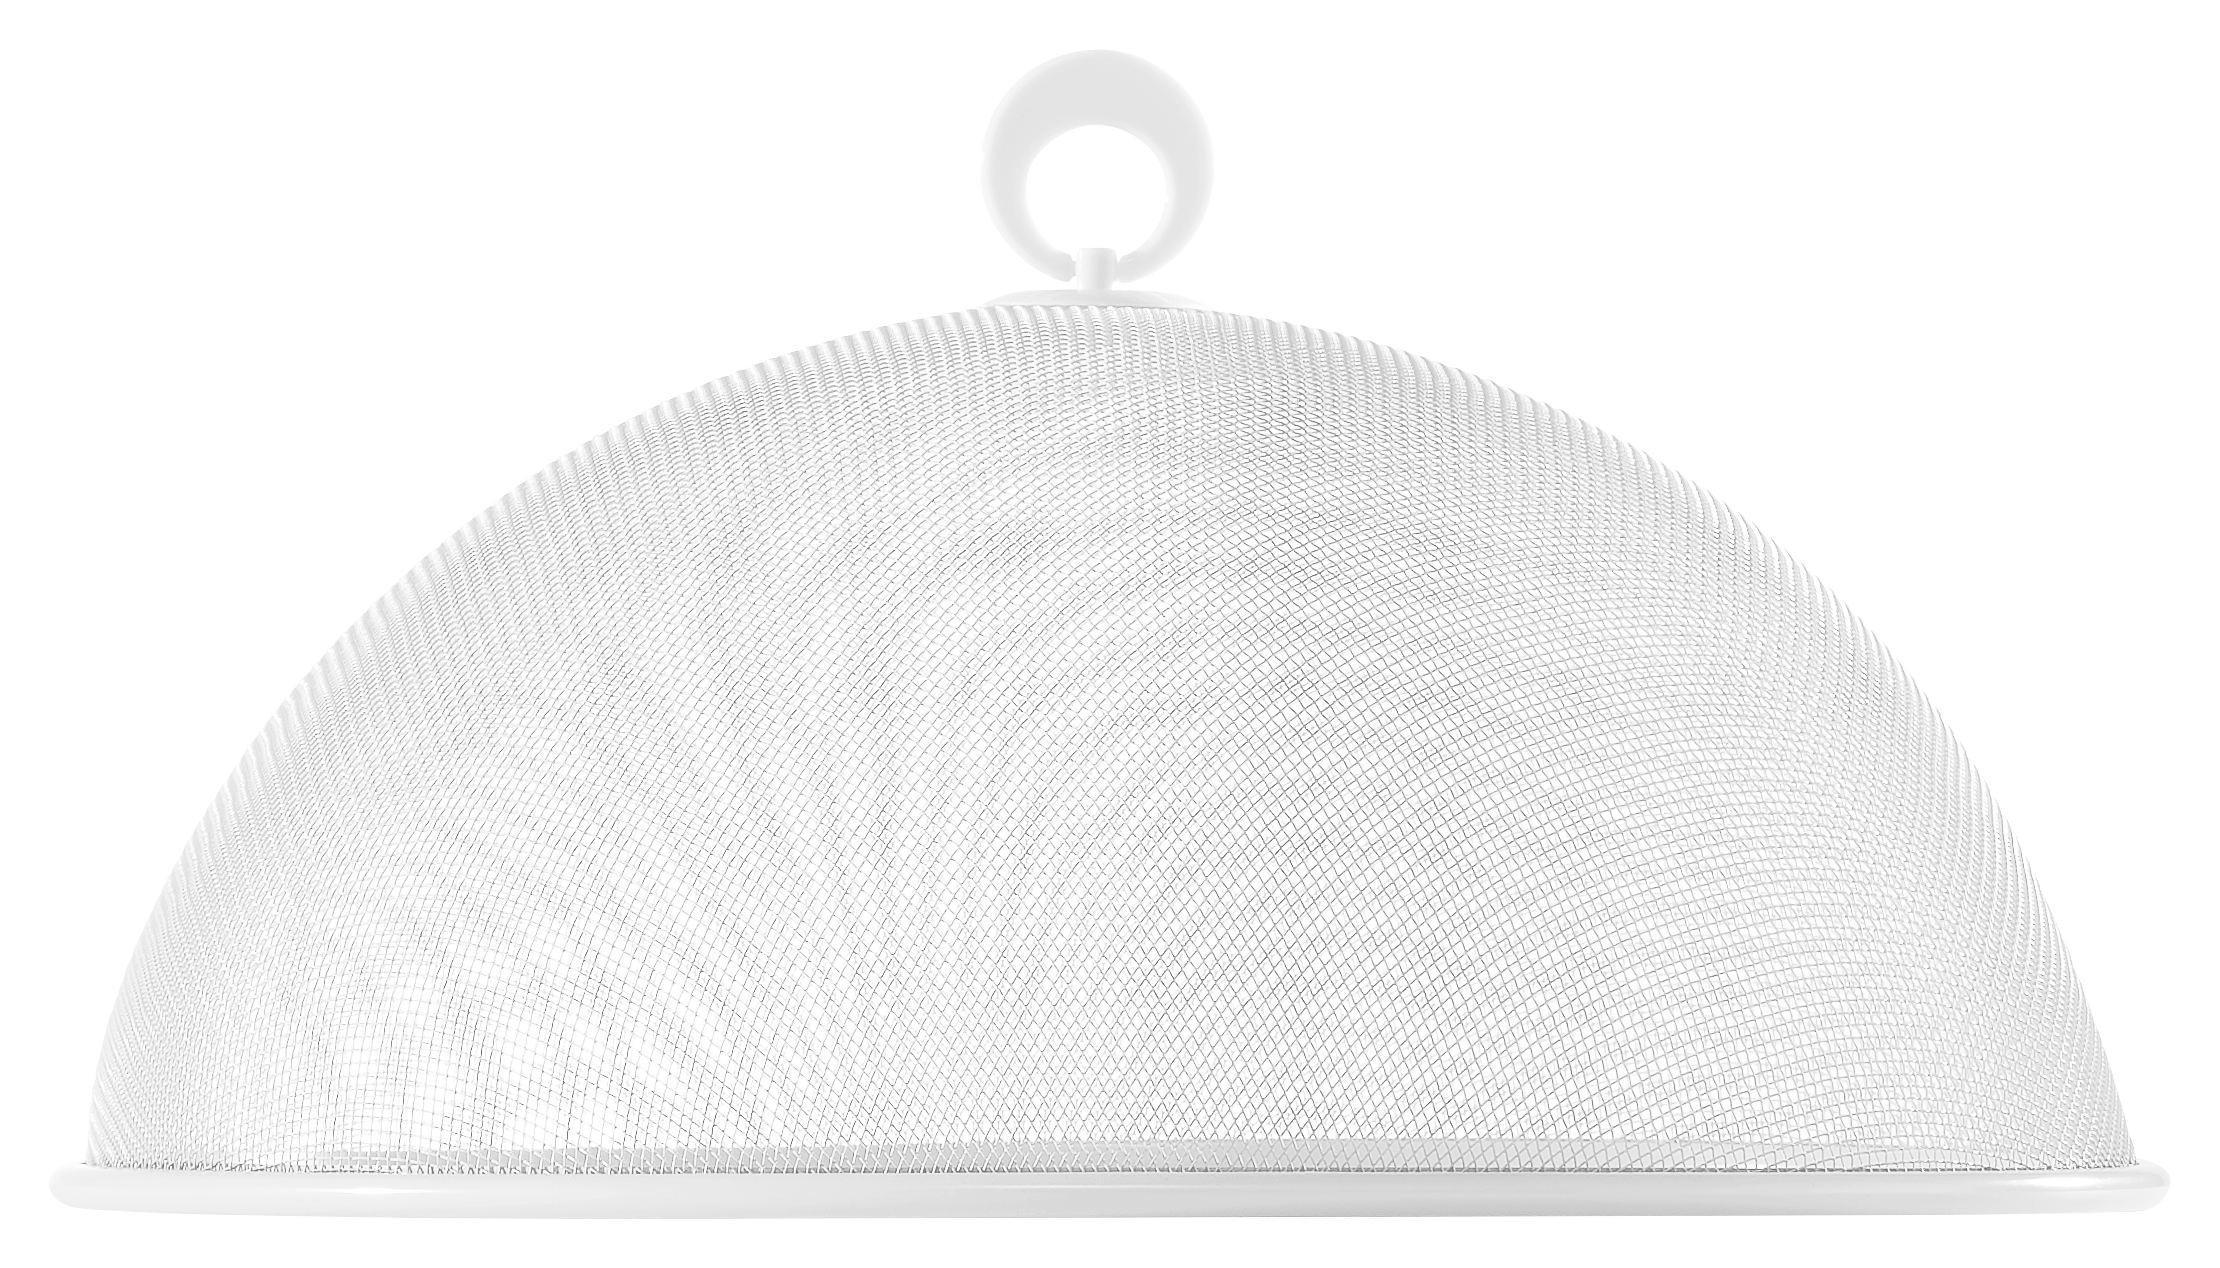 MATKUPA - vit, Basics, metall (35cm) - Homeware